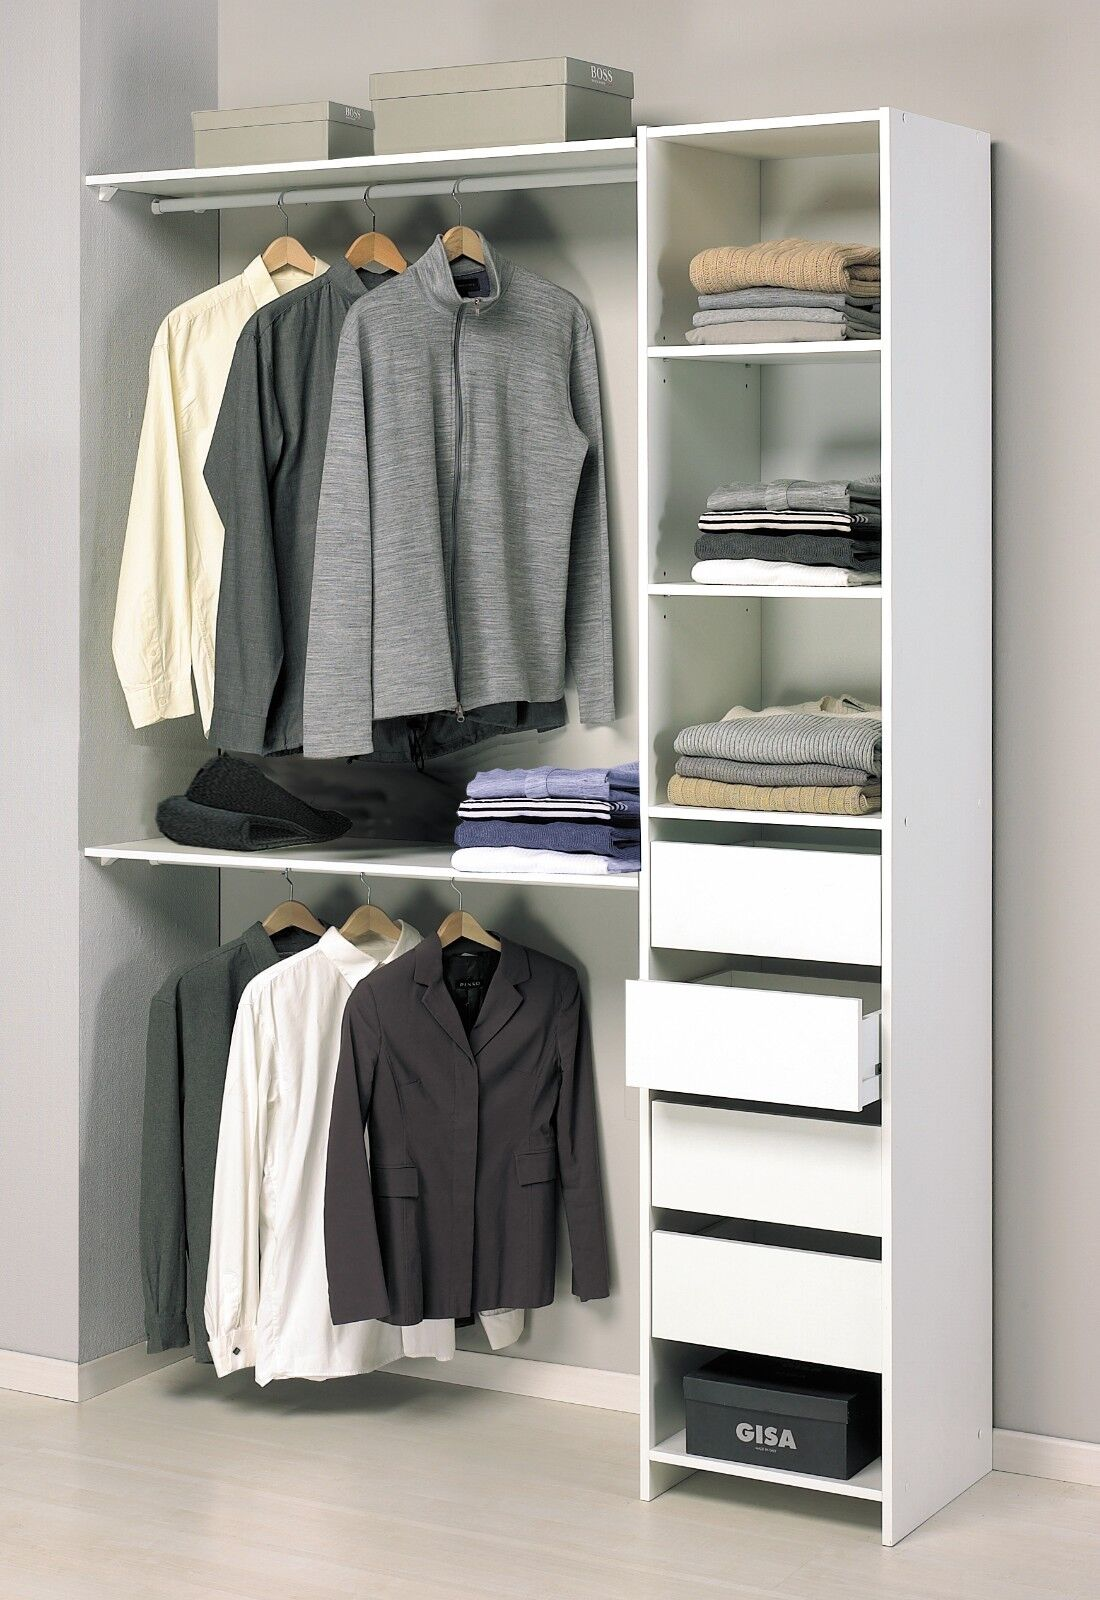 Armario ropero blanco auxiliar sin puertas de dormitorio o almacenaje auxiliar blanco 203x141cm e94763